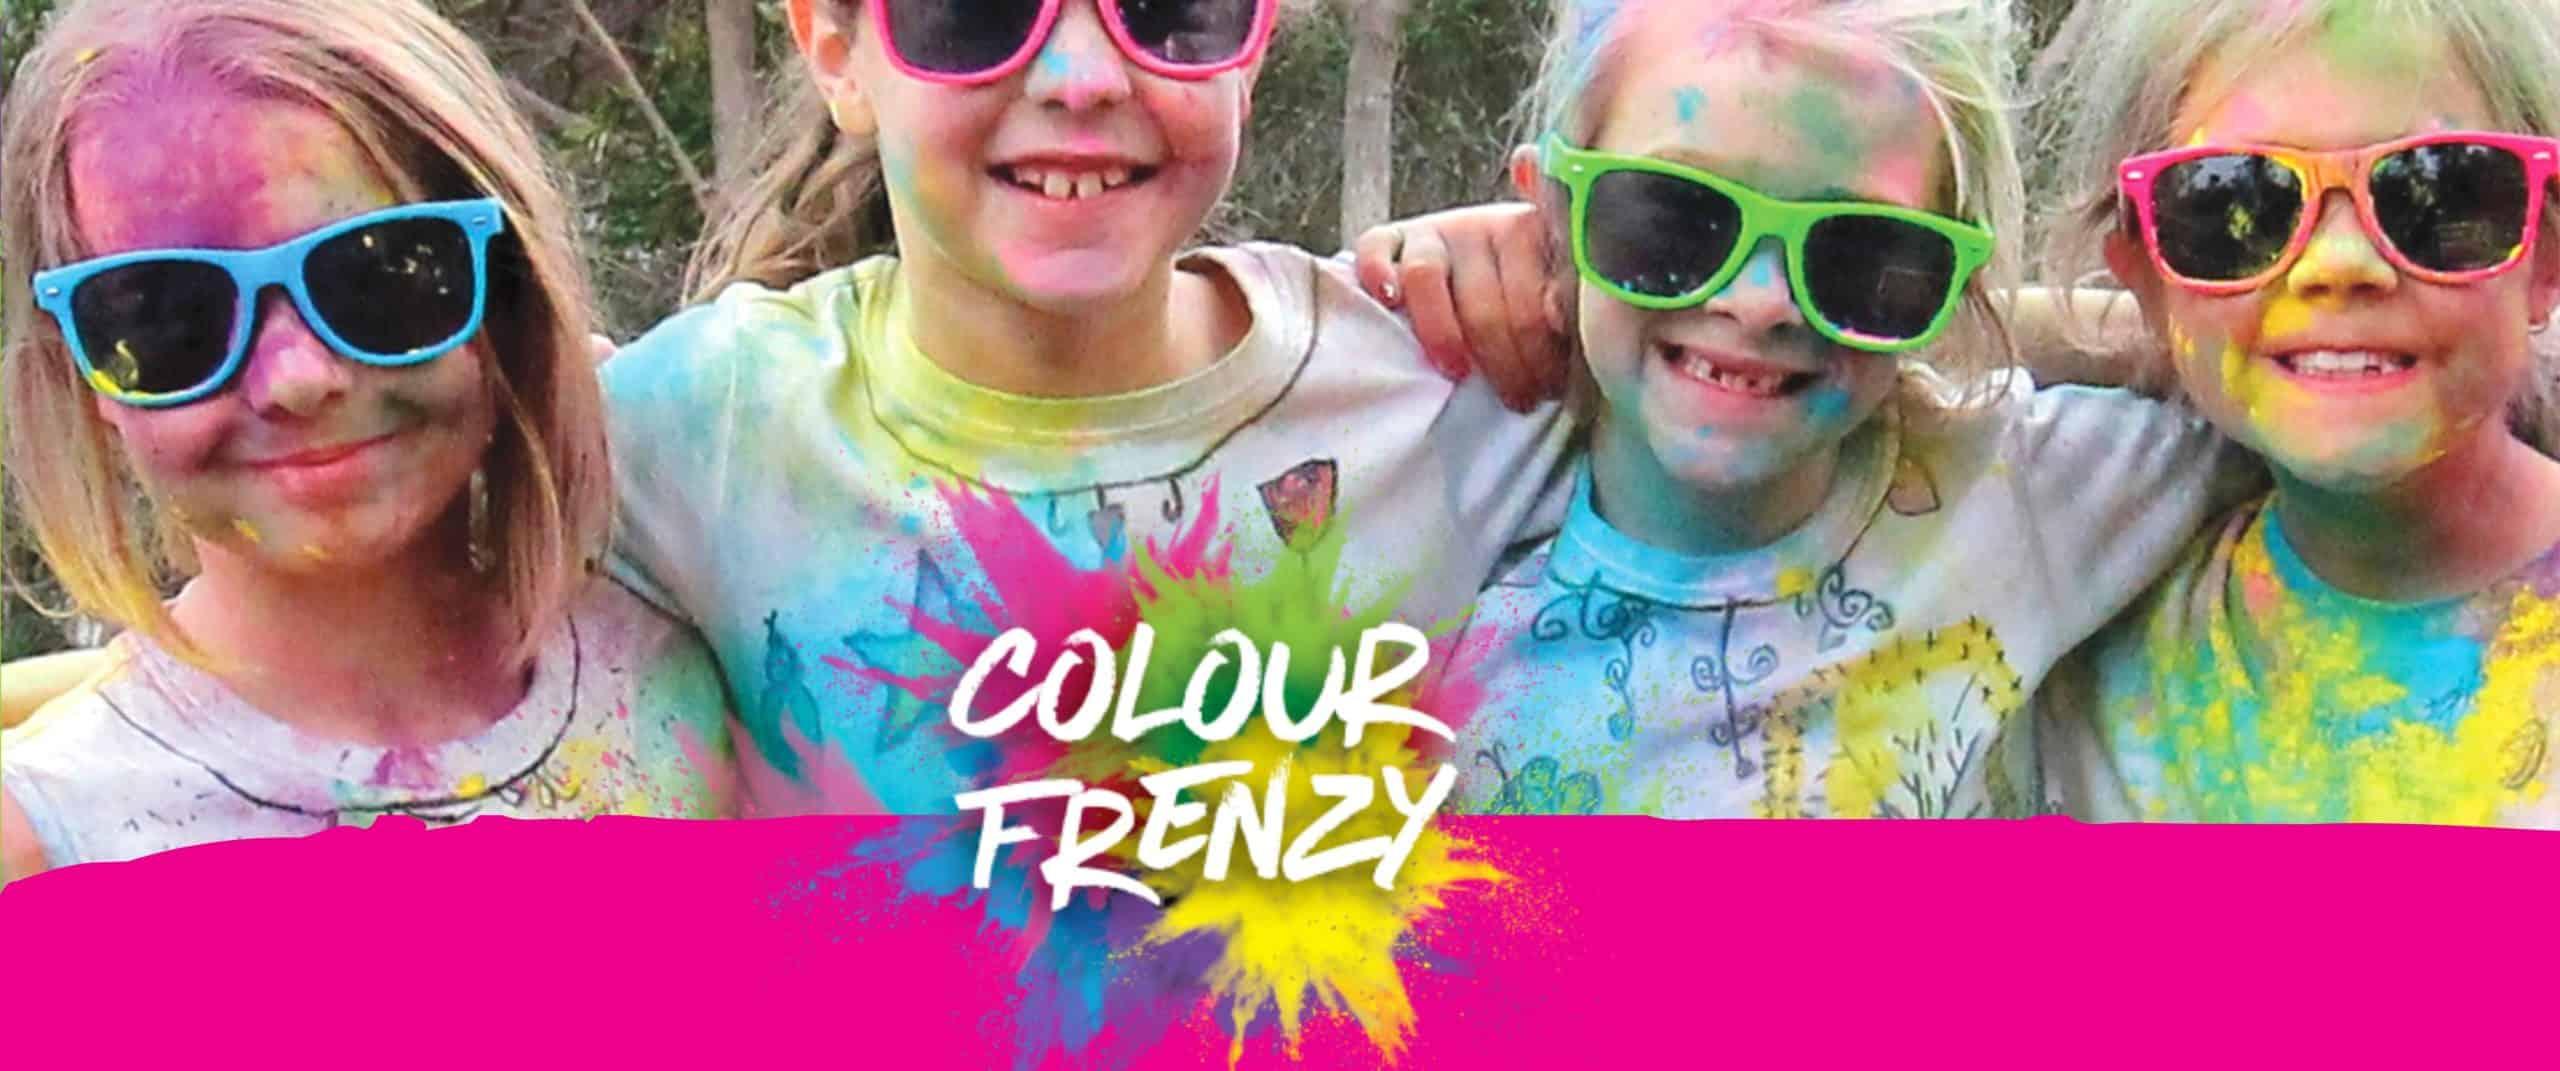 Colour Frenzy